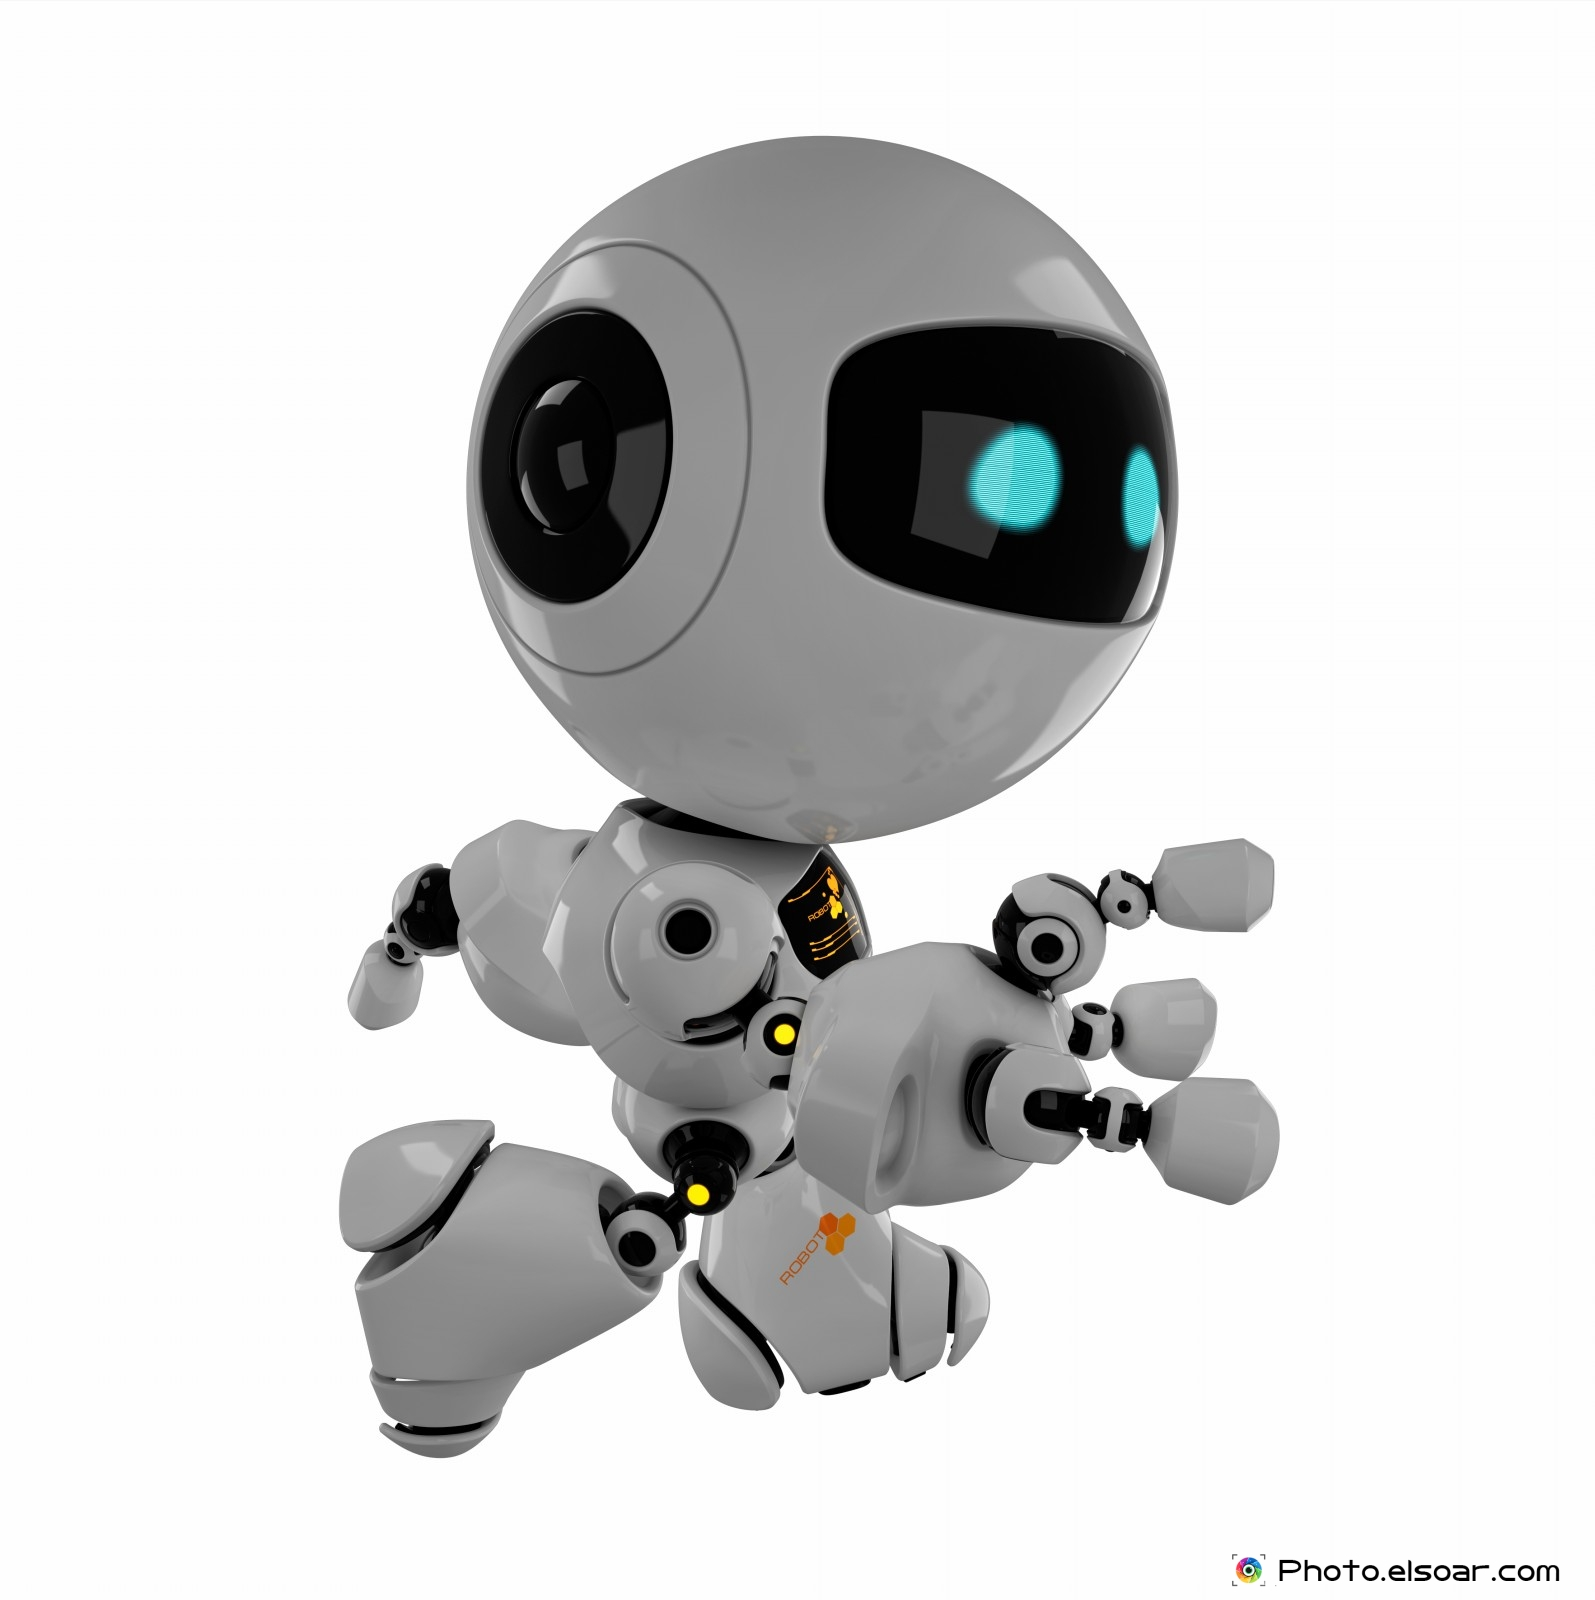 Cute Robot Designs Cute Running Robot on White